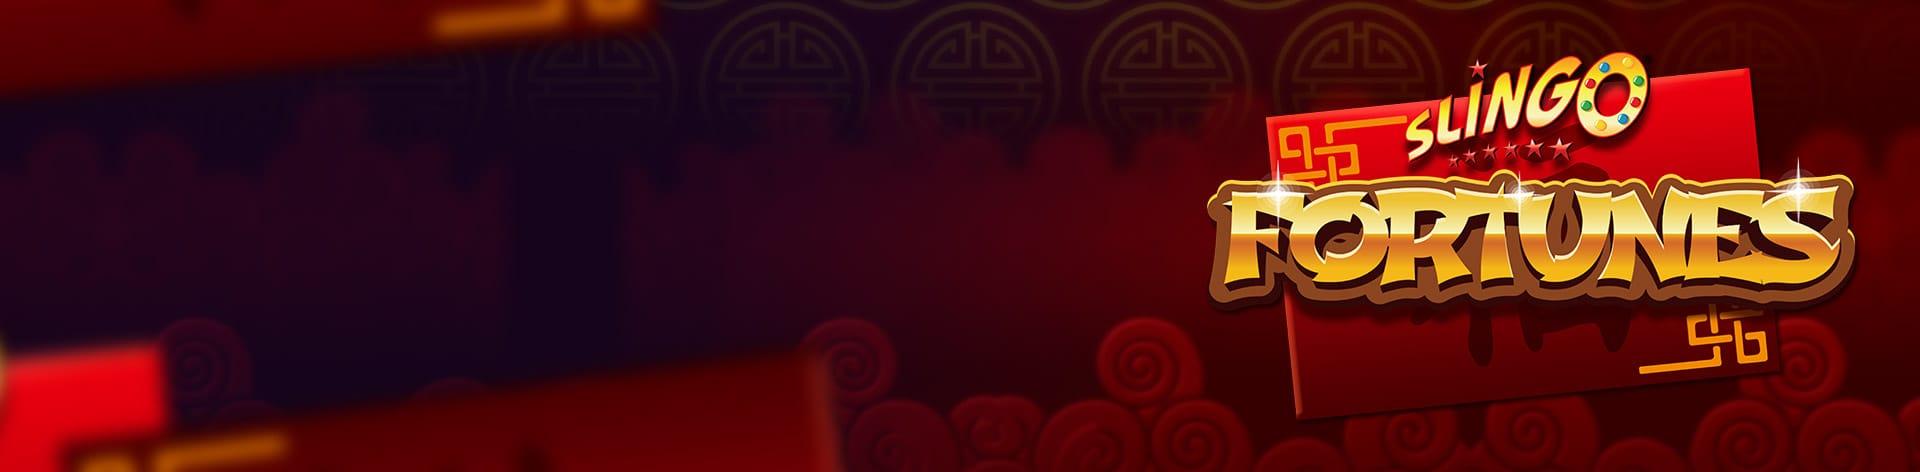 Slingo Fortunes Slot Logo Mega Reel